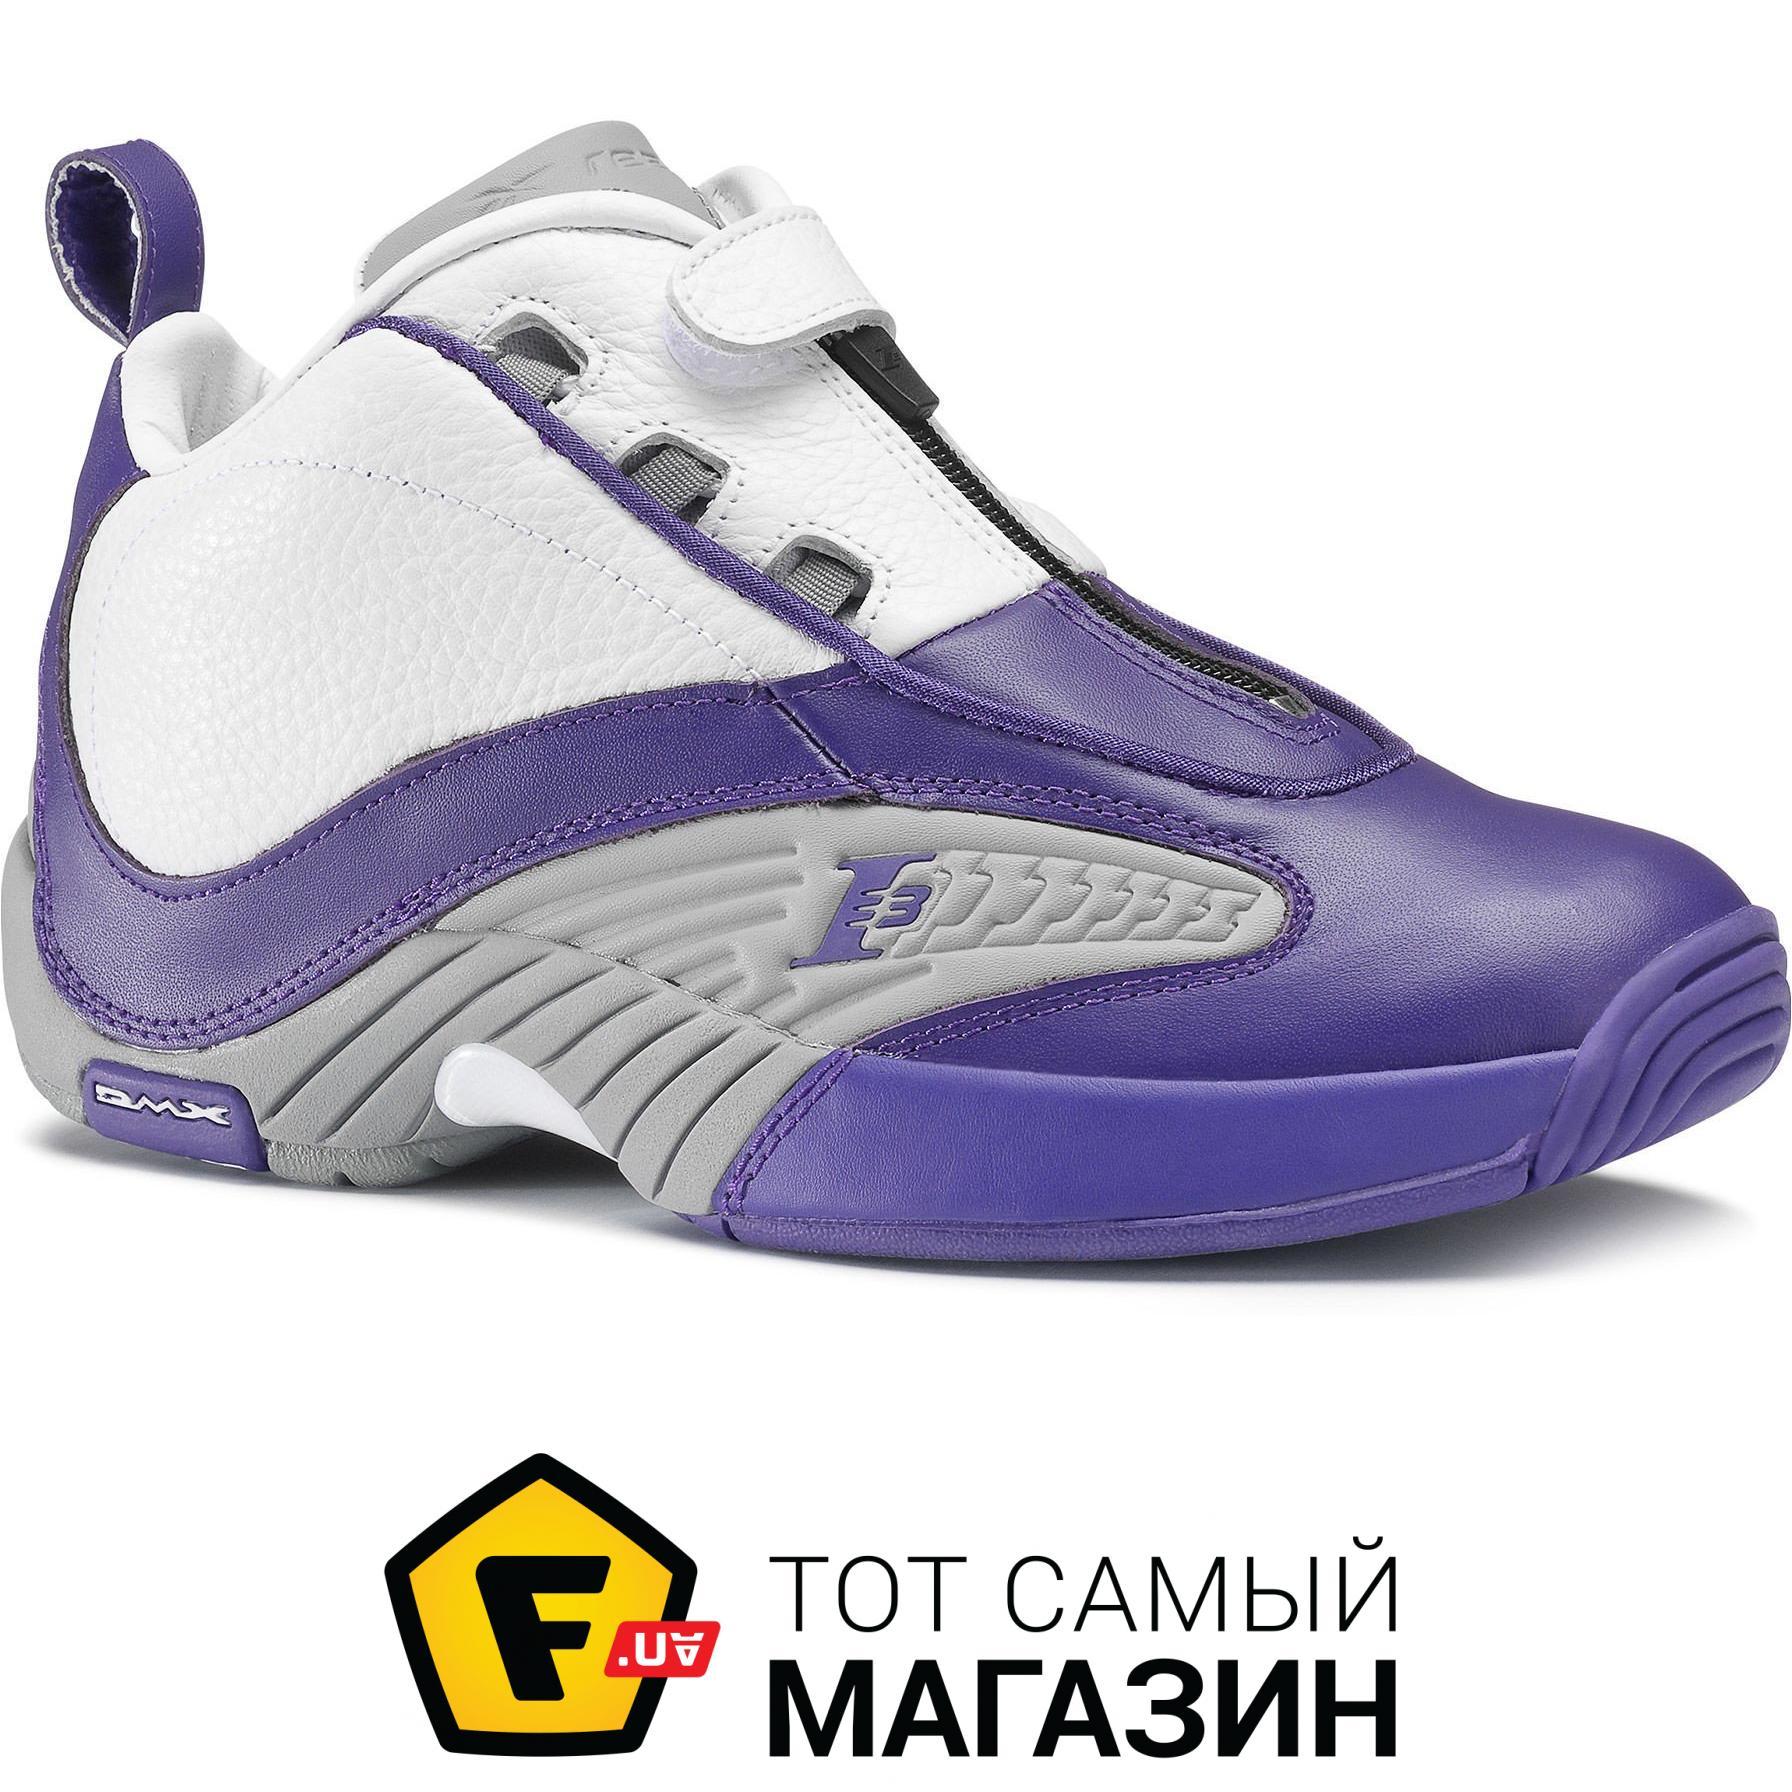 2b8f64c3 ᐈ REEBOK Answer IV PE мужские Team Purple / Flat Grey / White, 13 ...